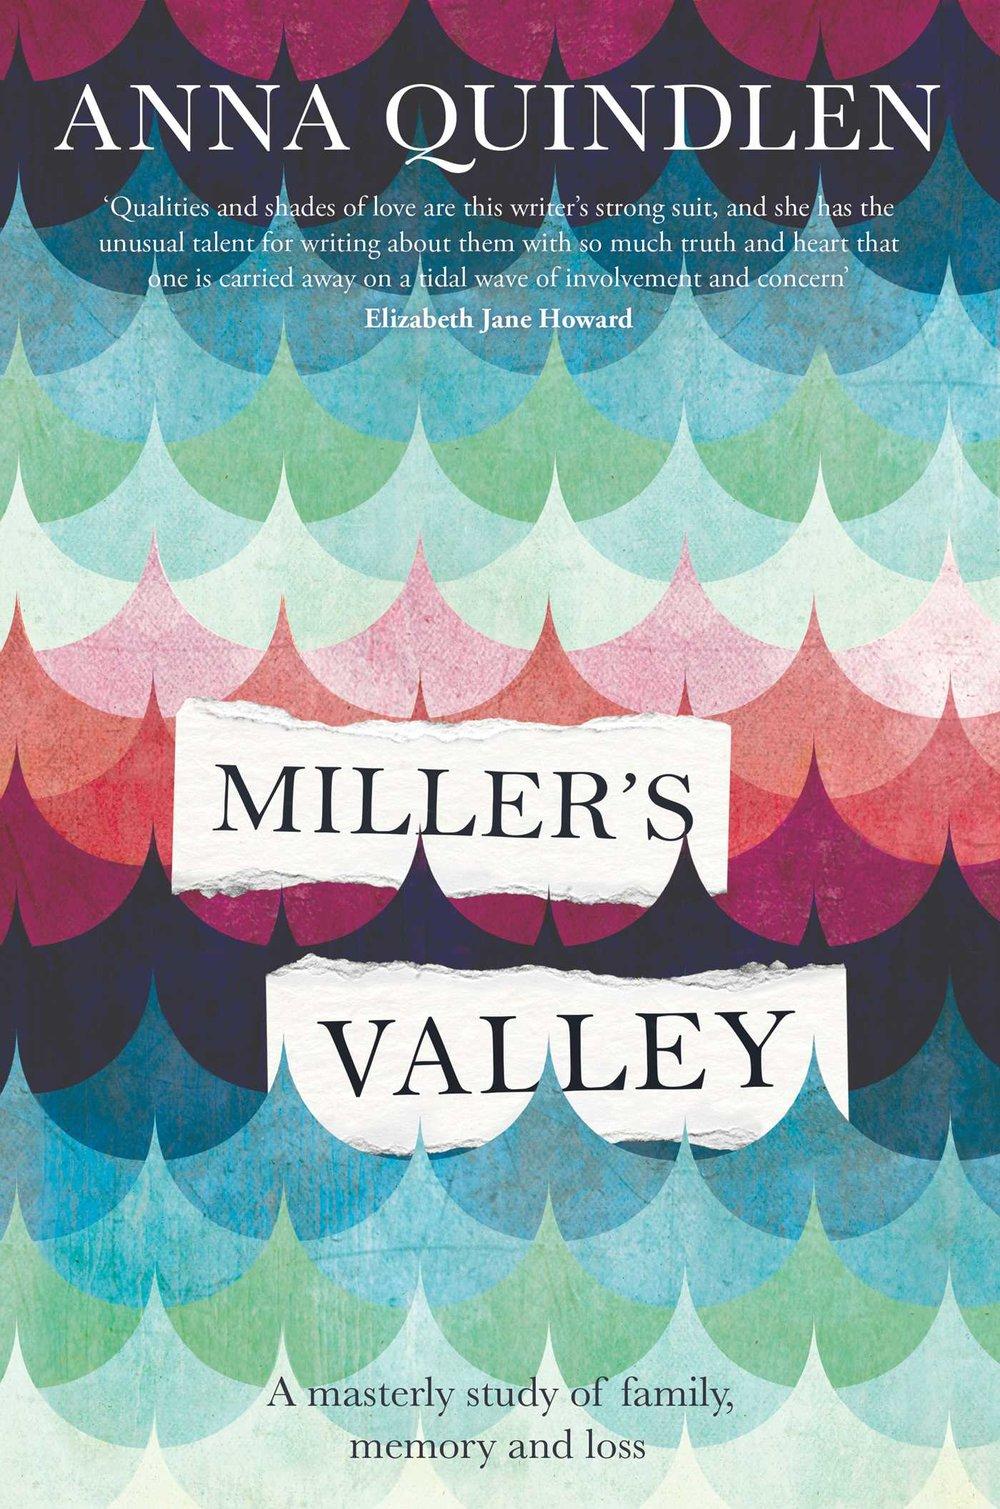 millersvalley.jpg